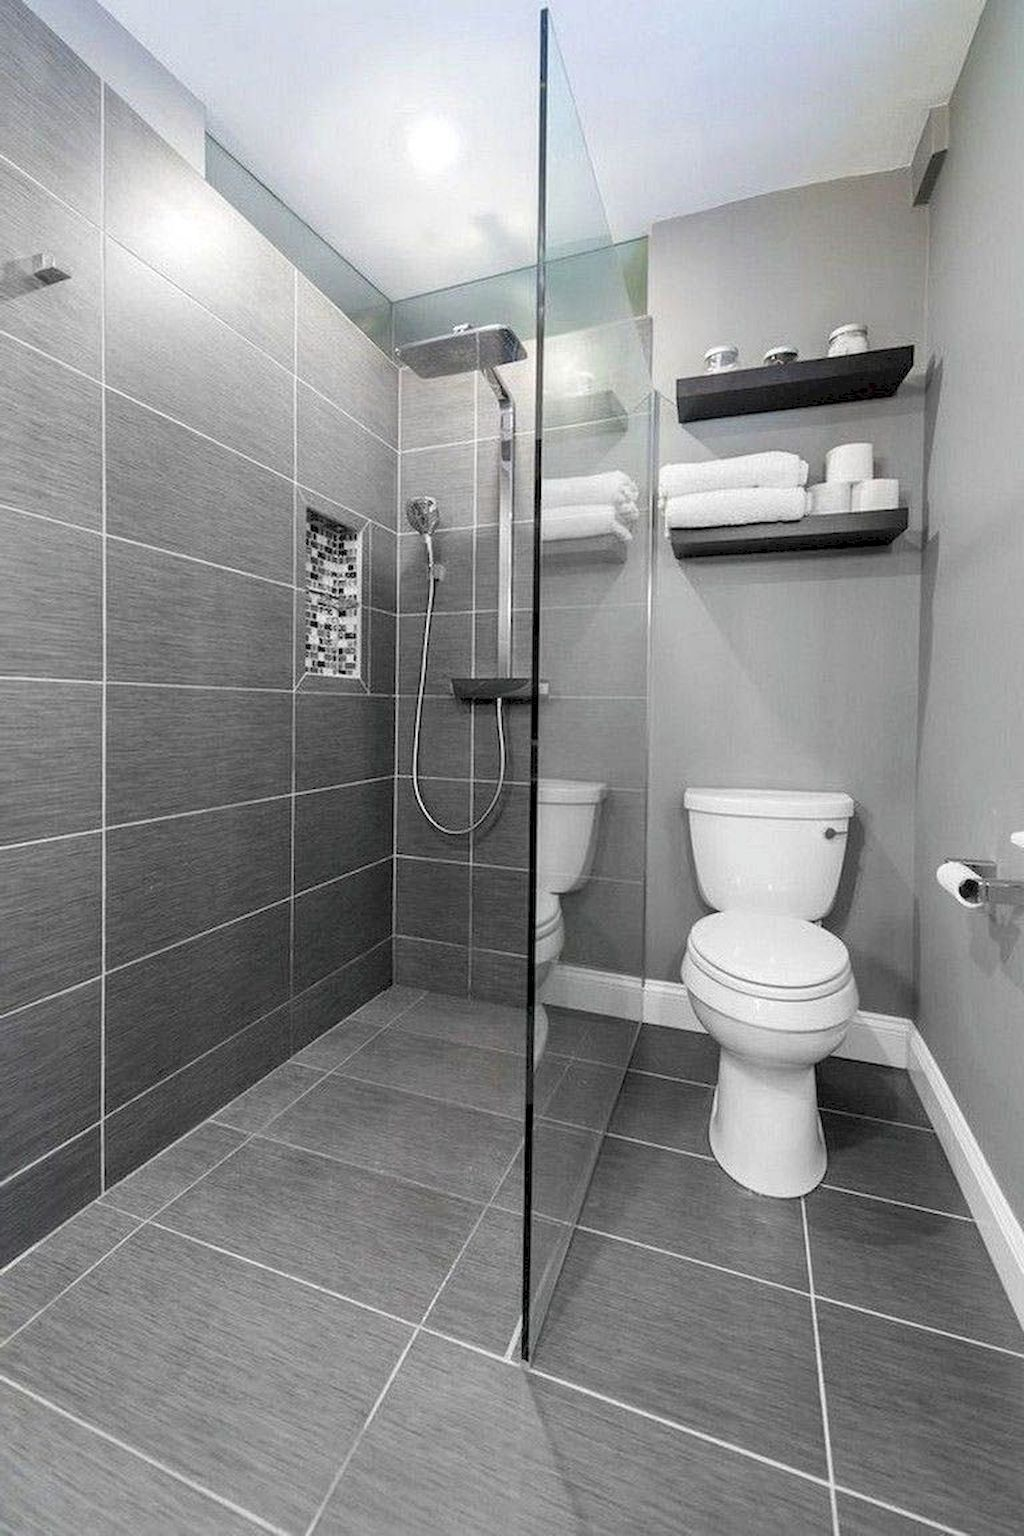 Small Comfort Room Tiles Design: 31 Bathroom Tile Ideas Make It Fresh And Not Boring